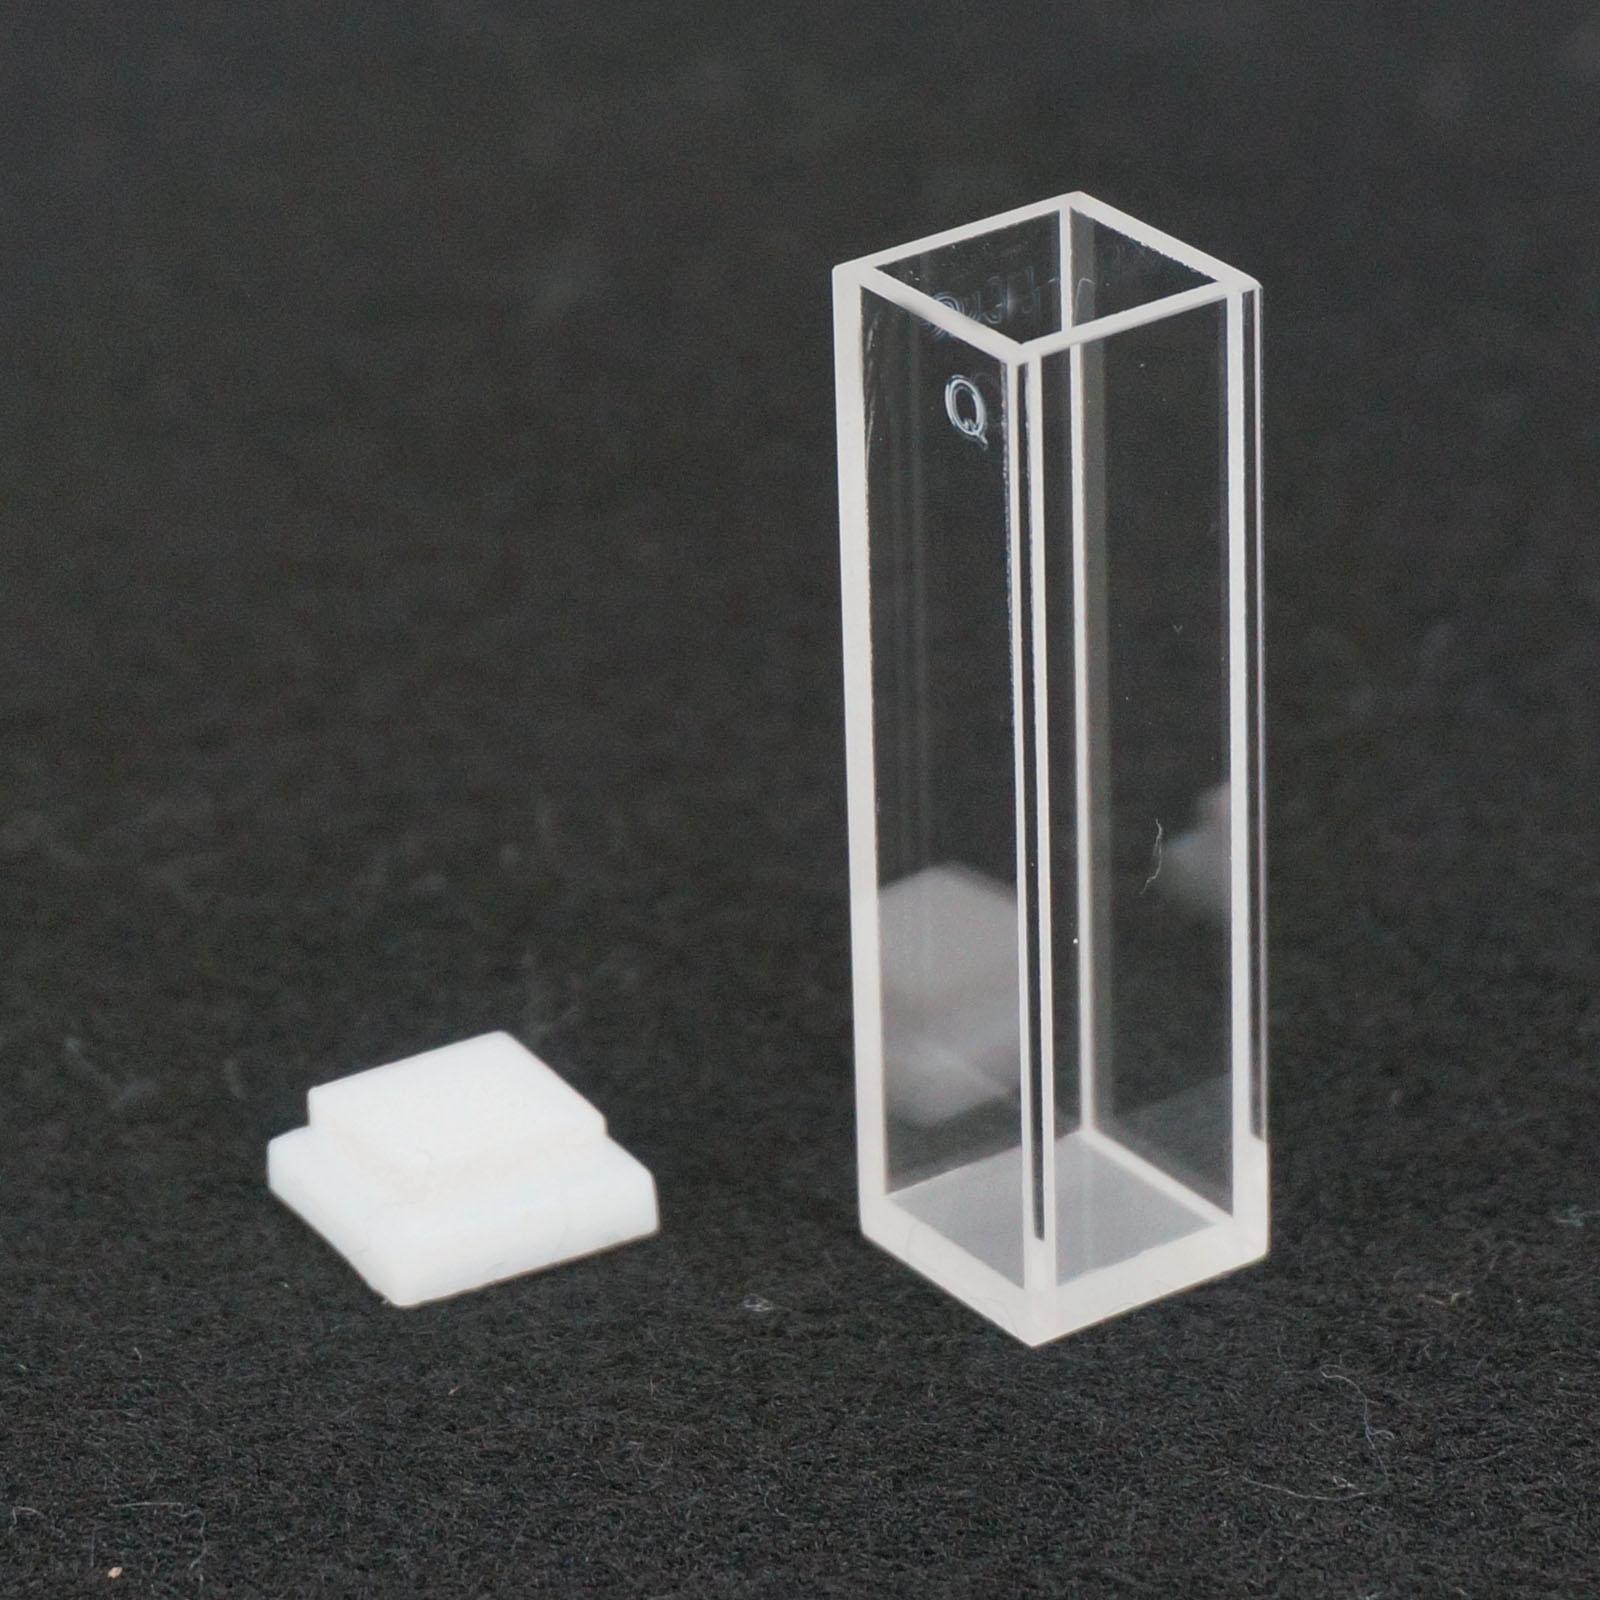 3.5ml 10mm Path JGS1 Quartz Cuvette Cell With Lid For Fluorescence Spectrometer 1pcs 5mm path length jgs1 quartz cuvette cell with with screw cap for spectrometer 4 widows